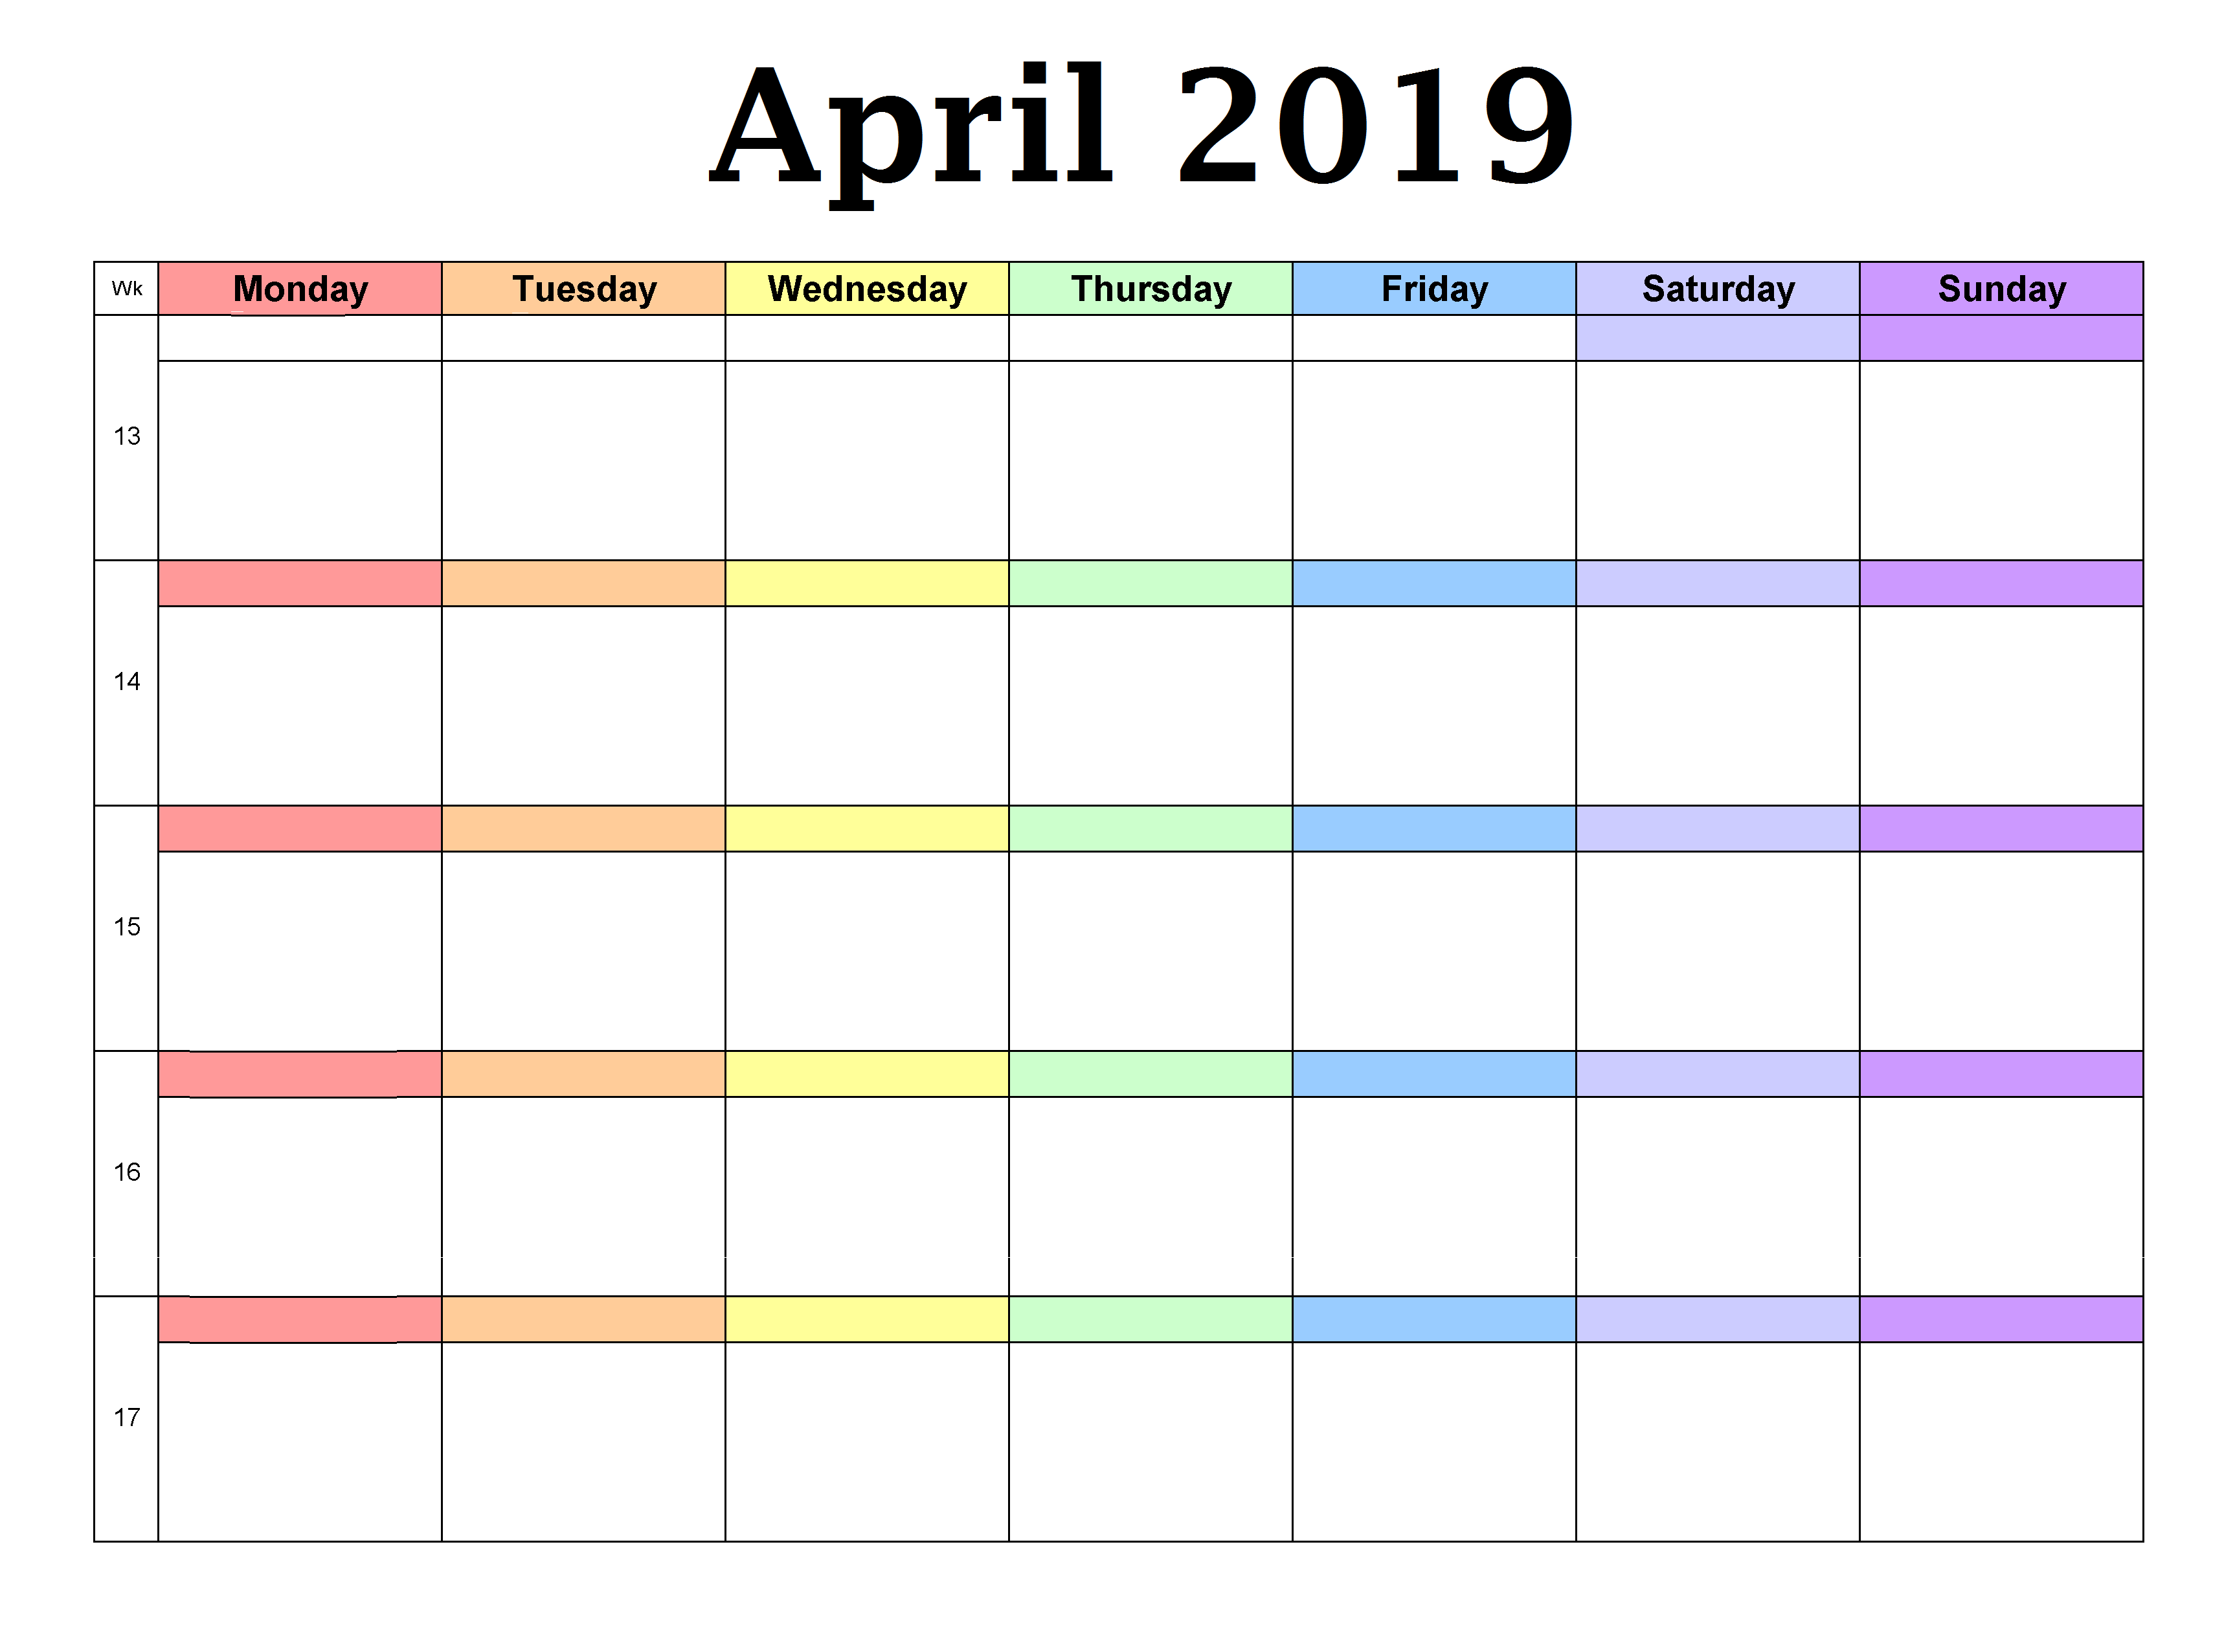 April 2019 Blank Planner